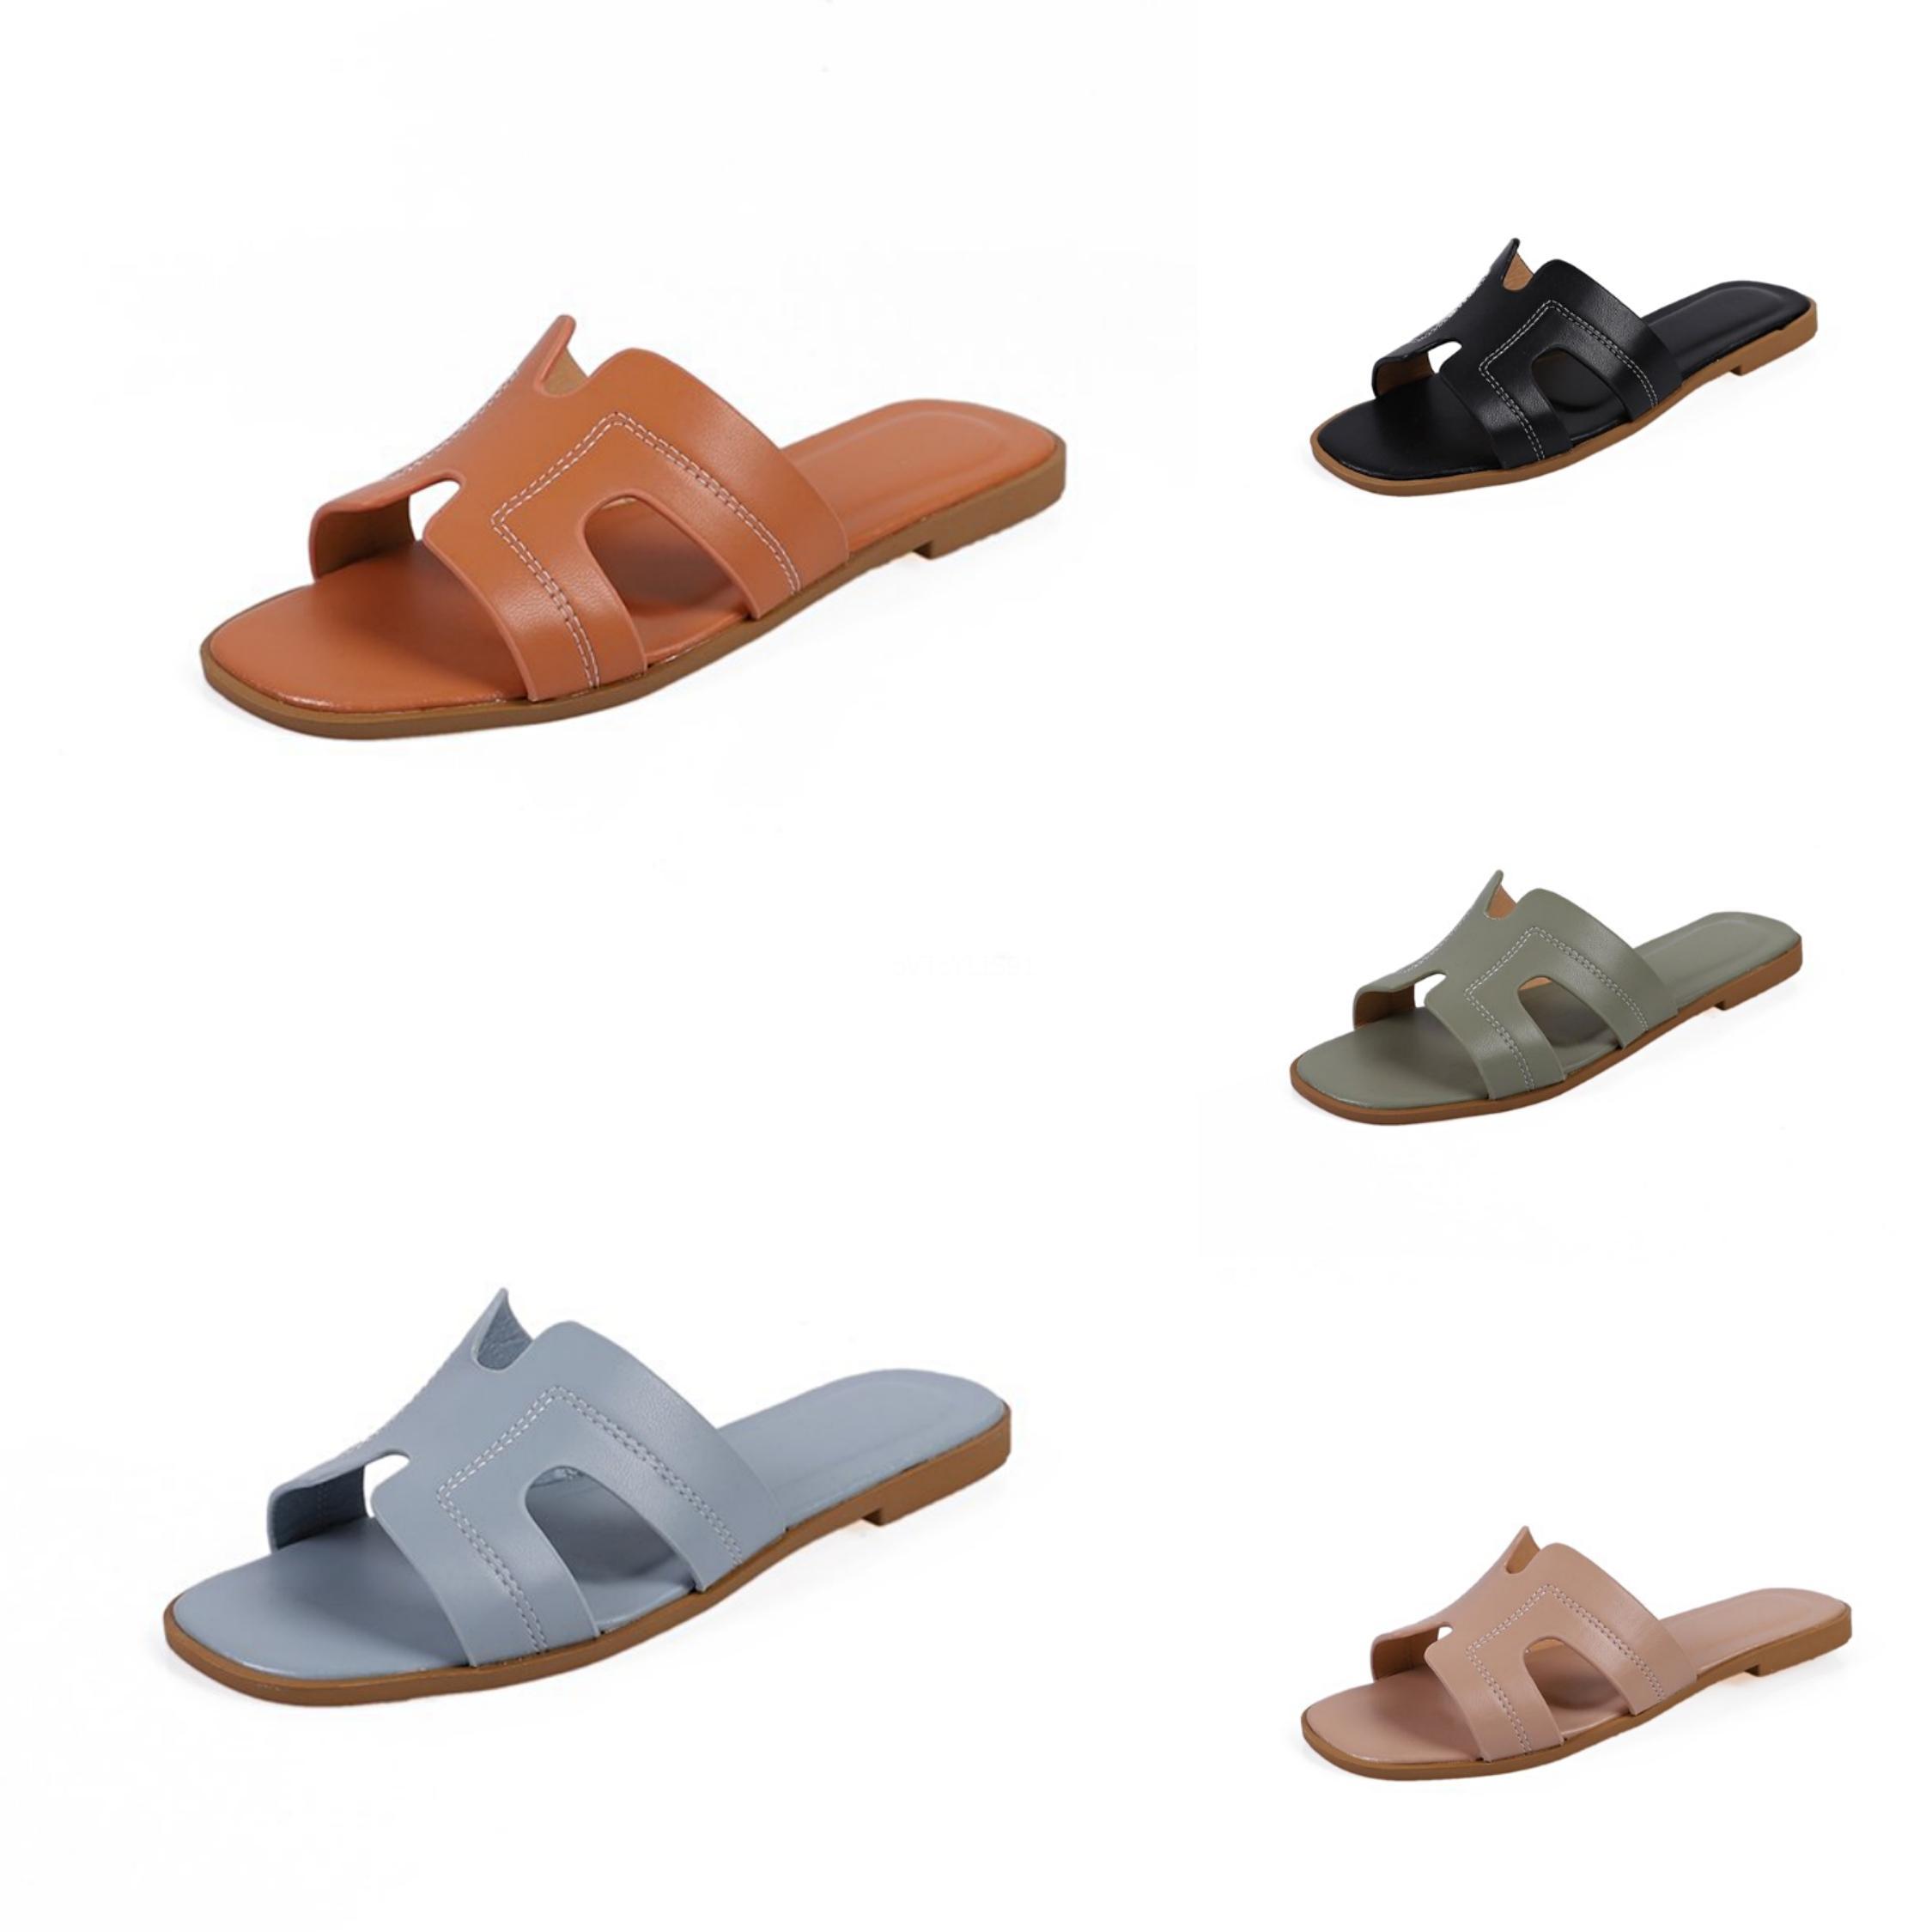 2020 neue koreanische Art-Mode Close-Toe Schuhe Damen Schuhe Sandal Dame Mischfarben Gebunden Cross- # 131